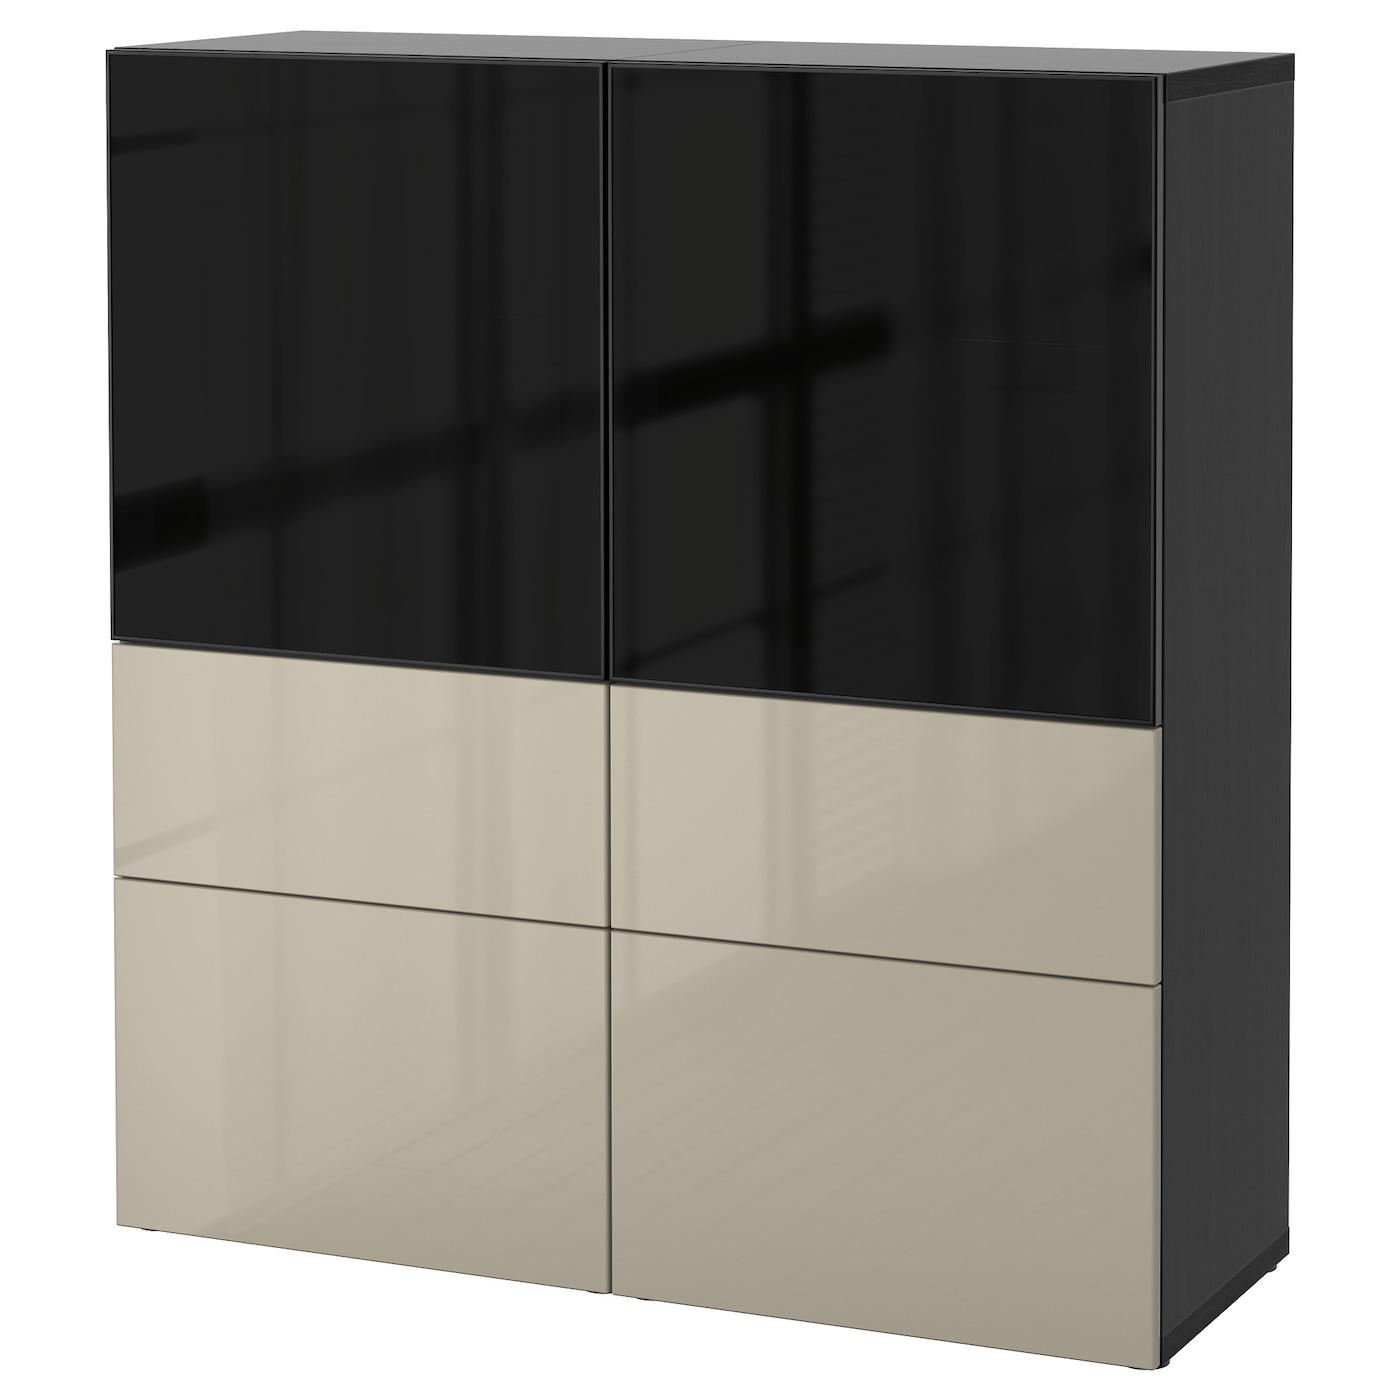 best combinaison rangement ptes vitr es brun noir selsviken brillant beige verre fum 120 x 40. Black Bedroom Furniture Sets. Home Design Ideas